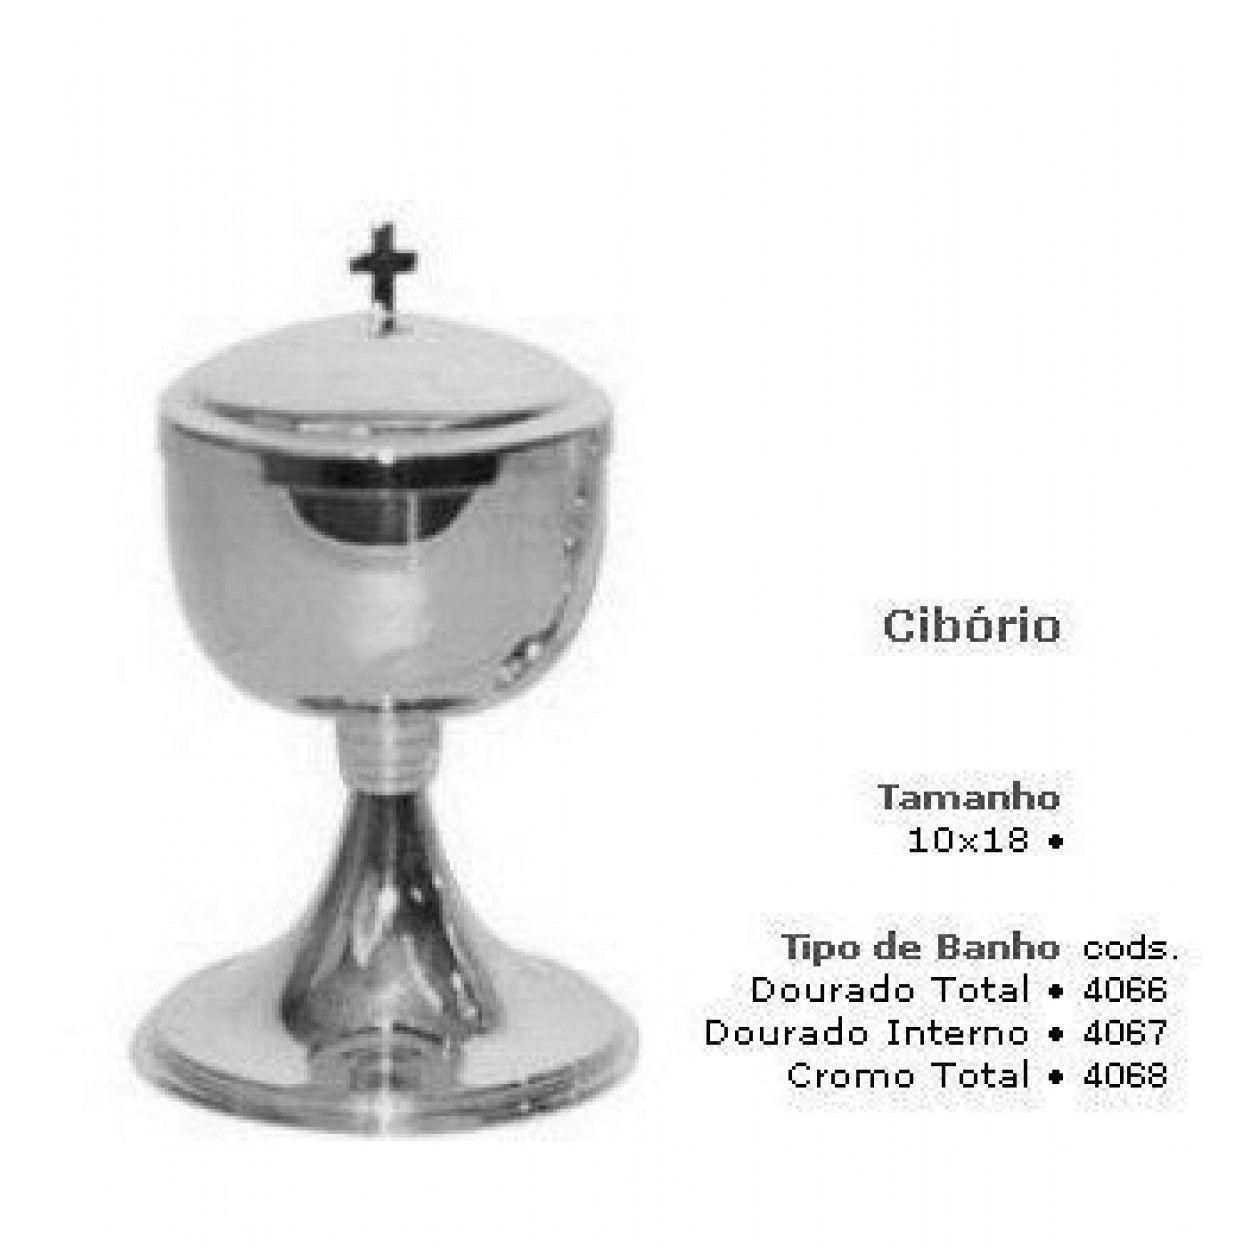 CIBÓRIO 9019 CROMO TOTAL 4068